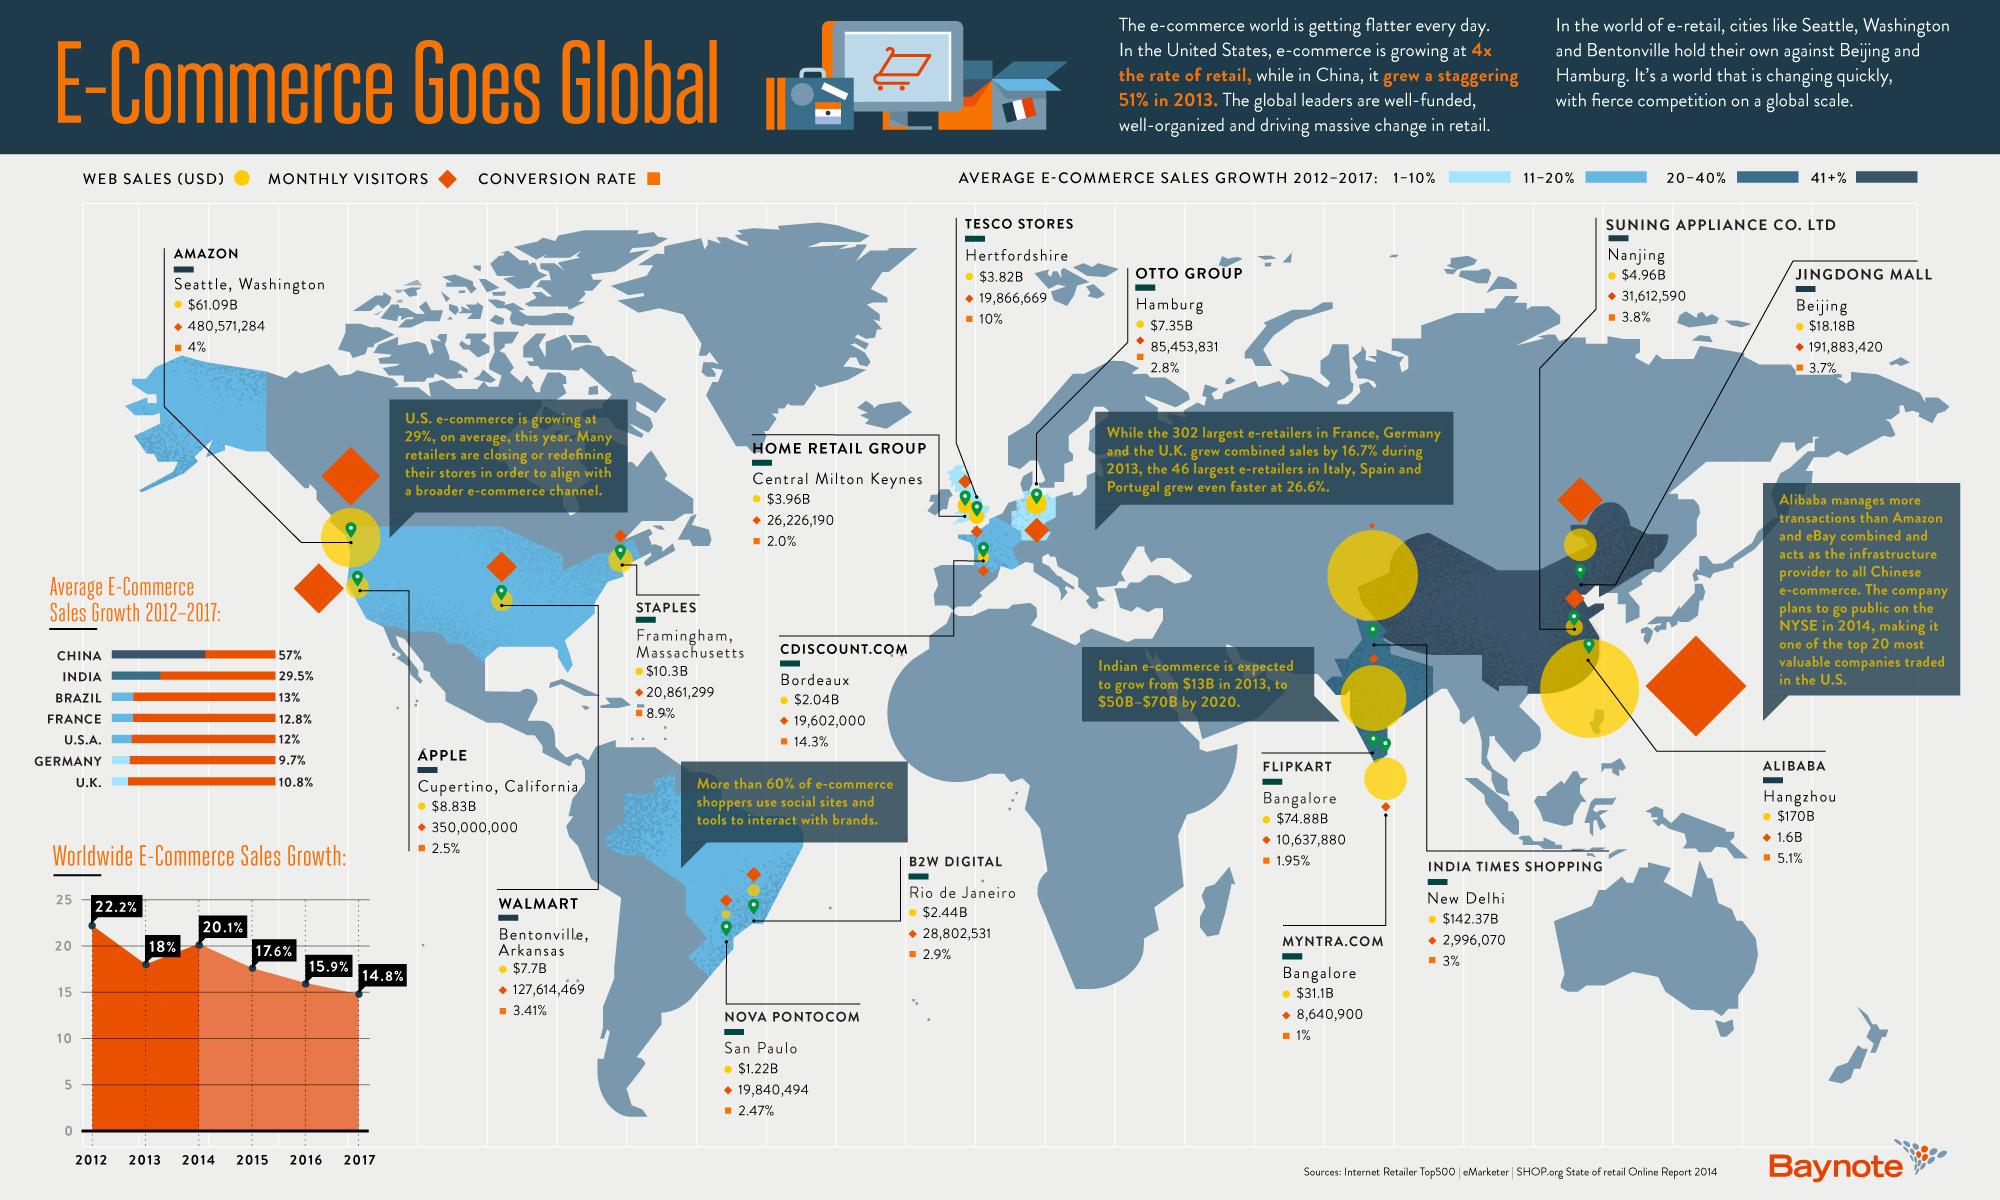 Infografik: Wo auf der Welt boomt E-Commerce gerade?